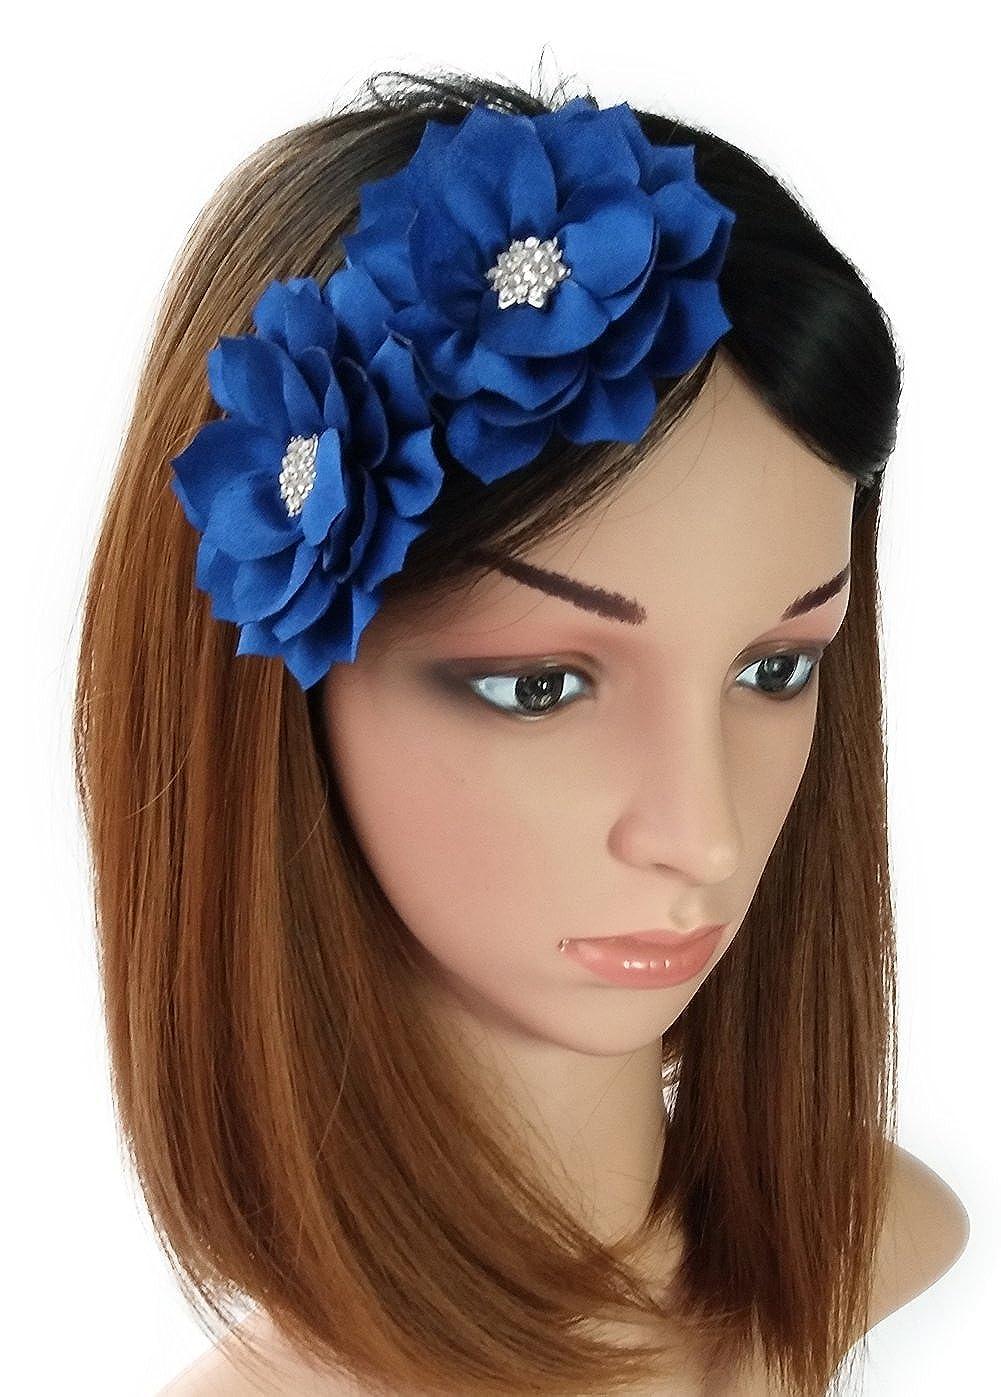 Fascinator Headband Hair Clip Lotus Flower Bridal Wedding Party Cocktail Headwear